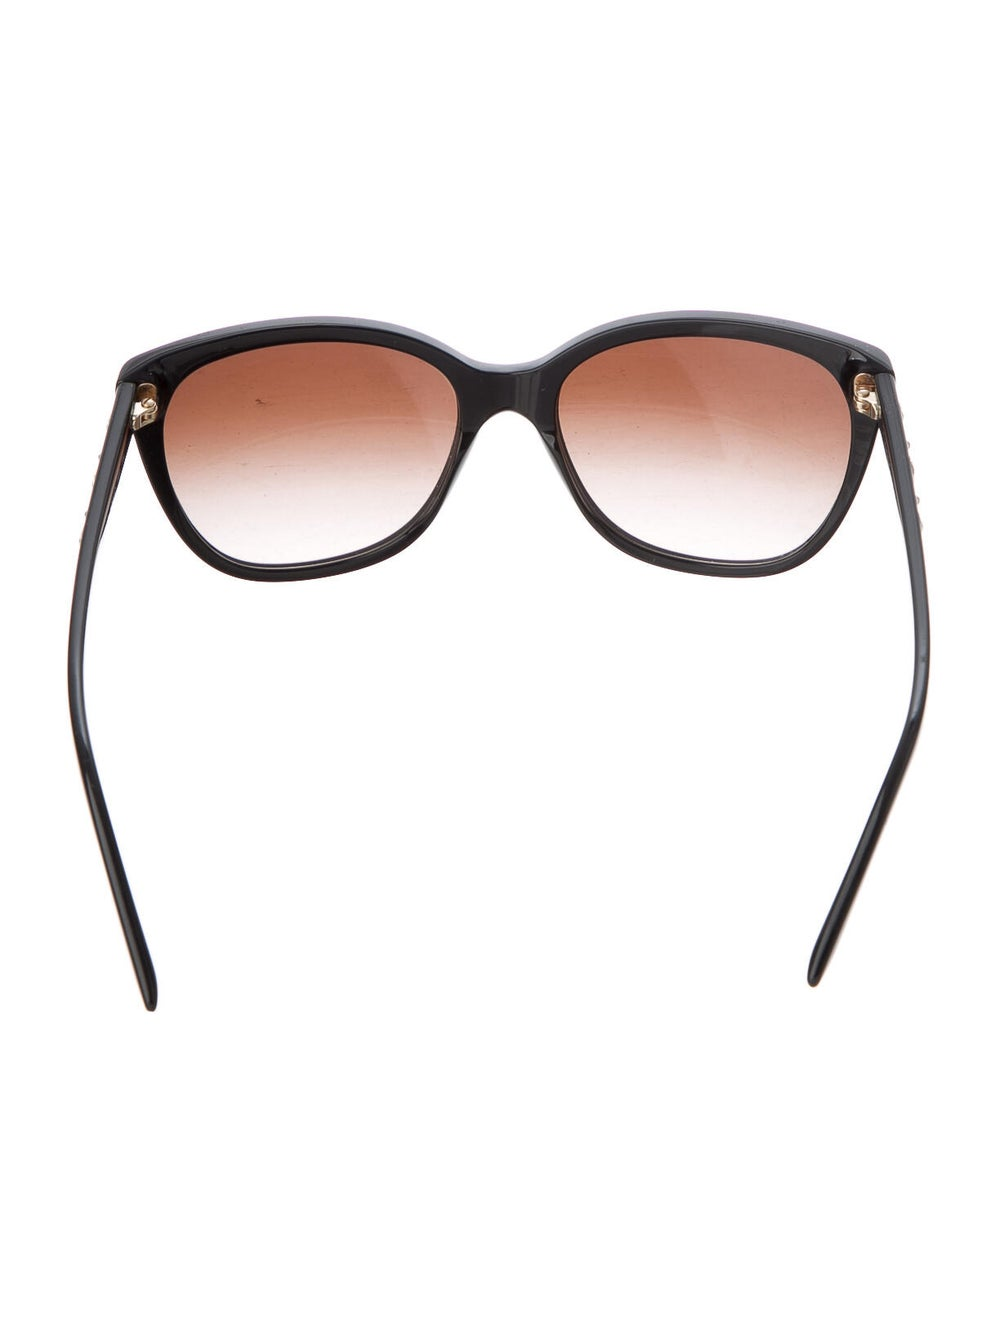 Versace Medusa Insignia Cat-Eye Sunglasses Black - image 3